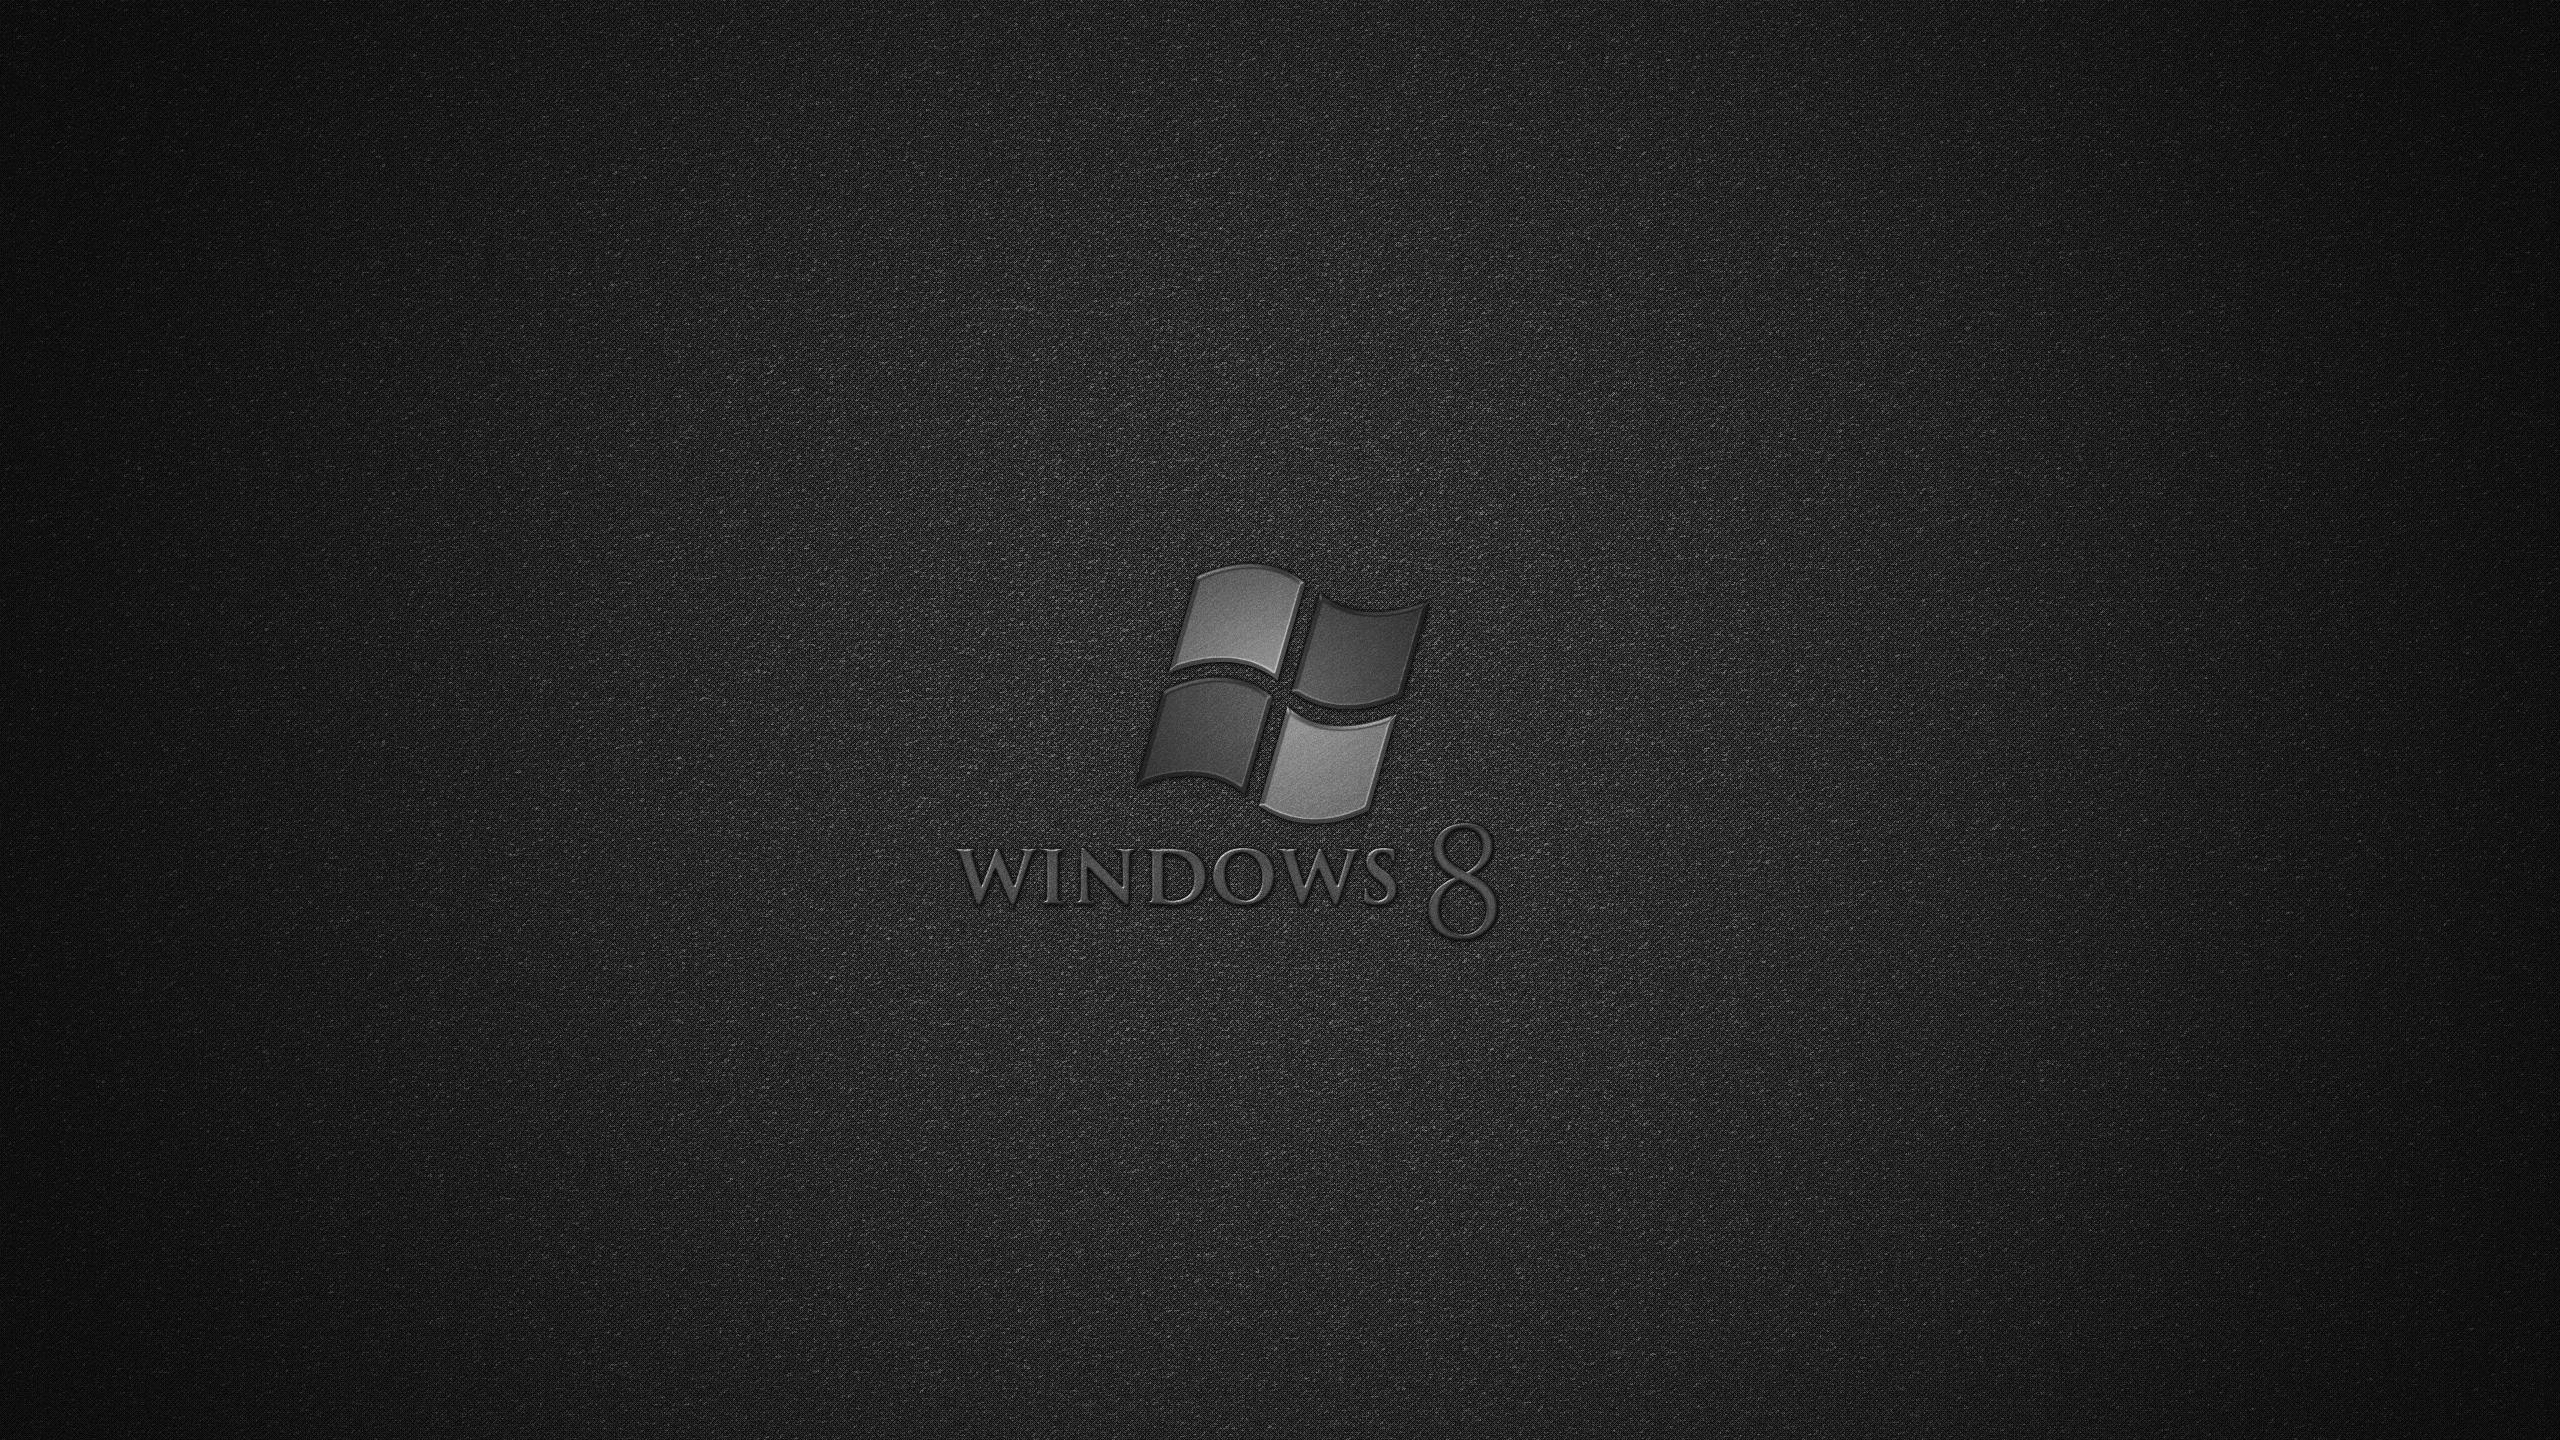 Wallpaper hi tech windows 8 pc microsoft greys wallpapers hi tech 2560x1440